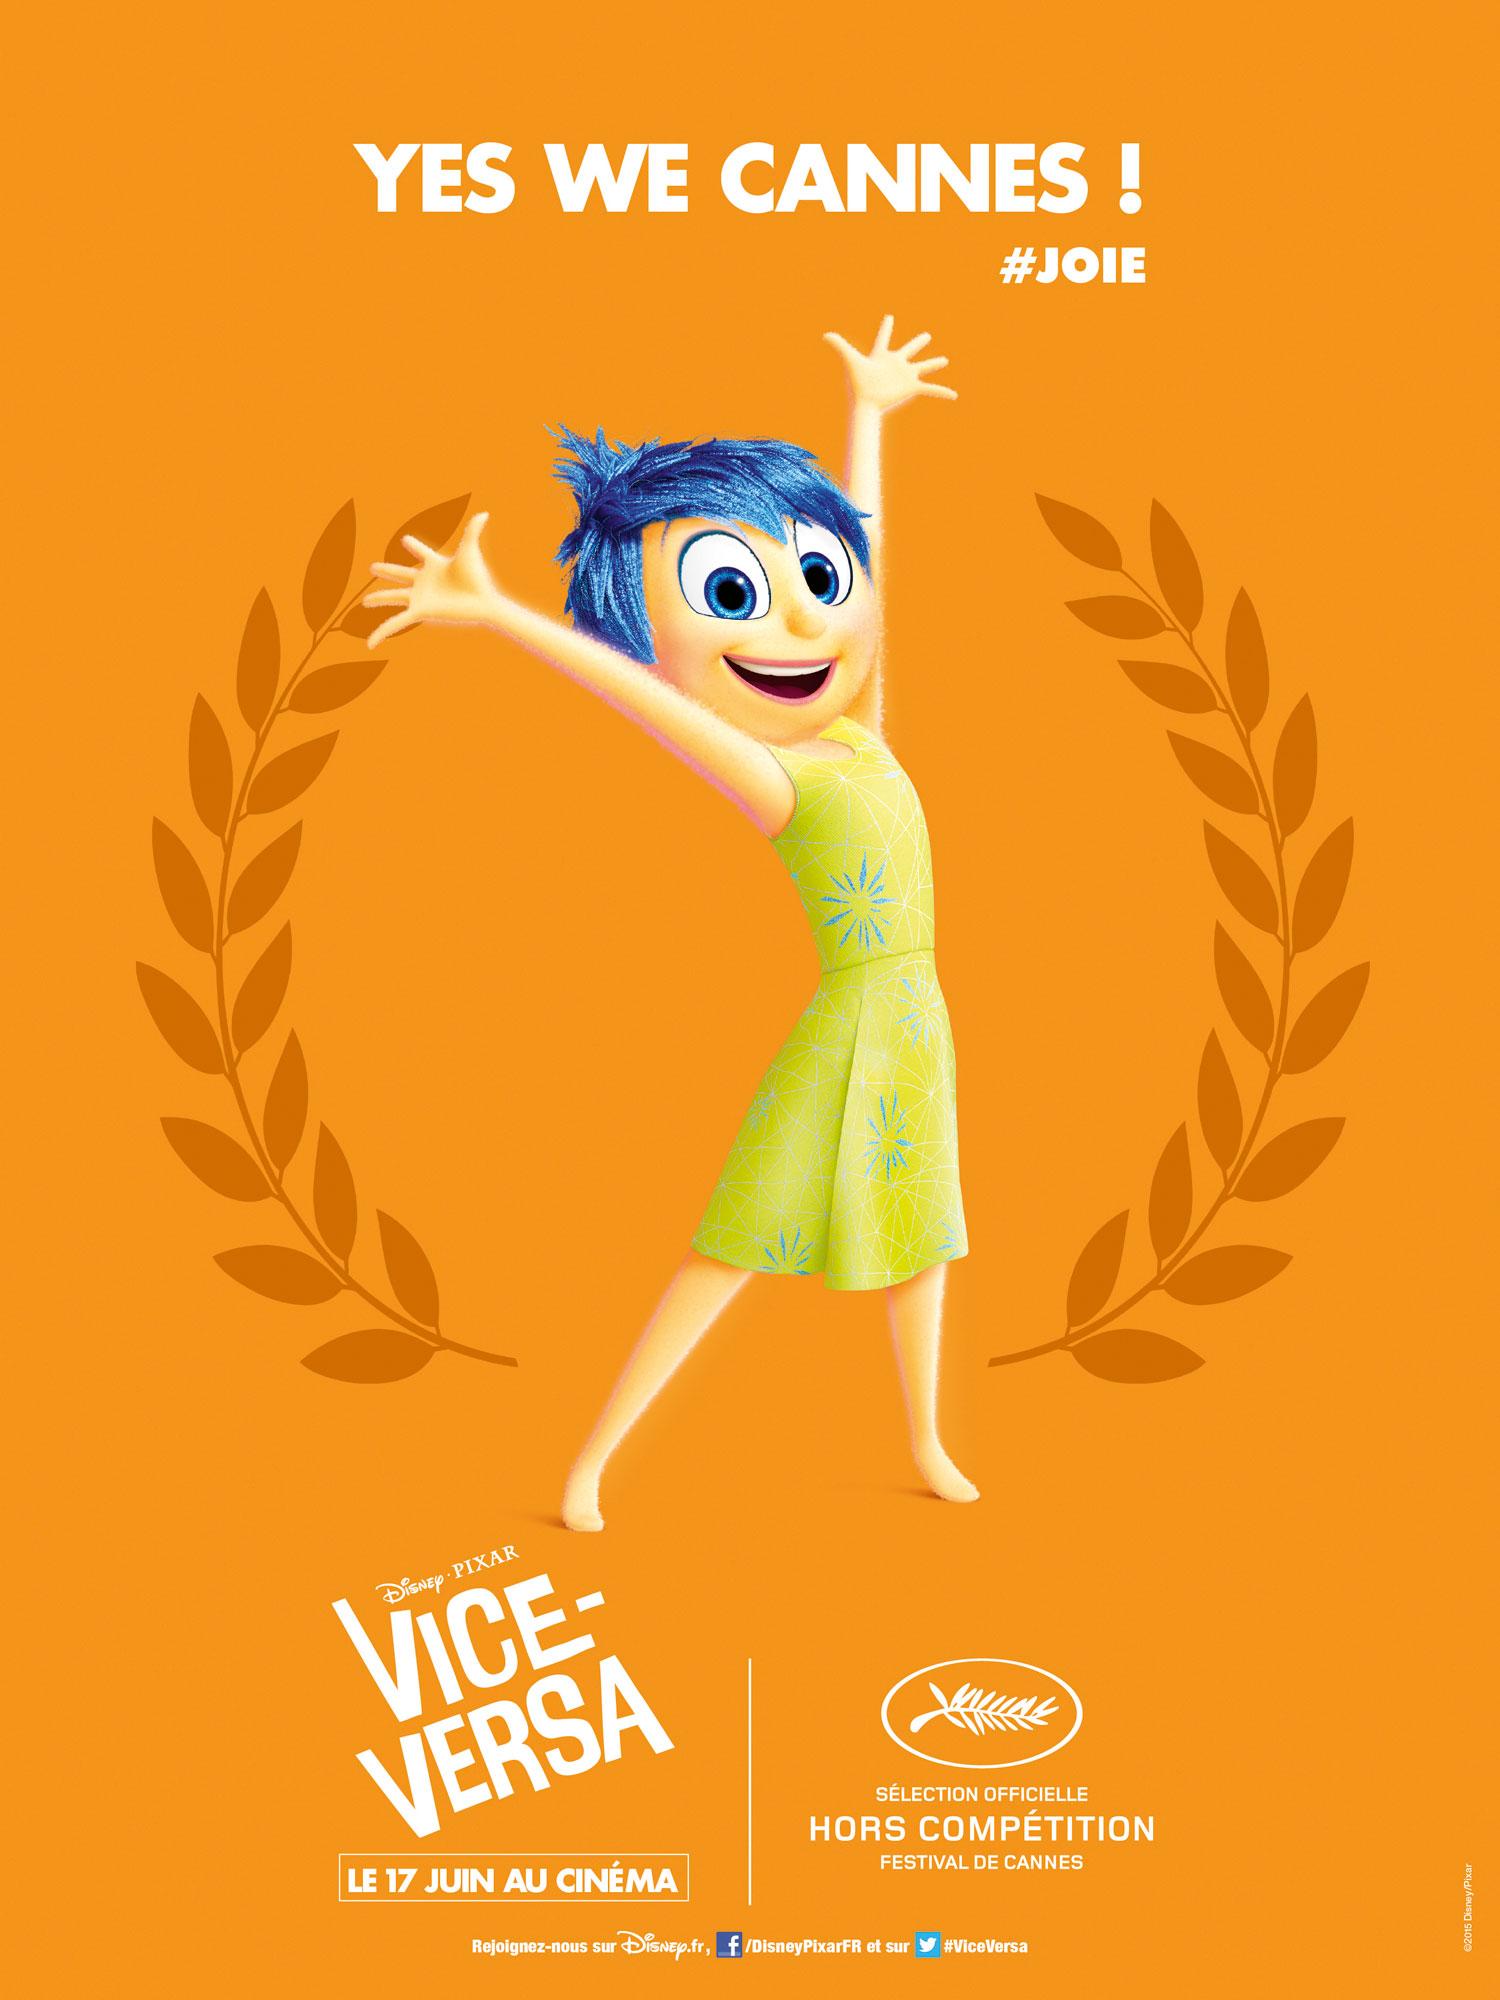 Vice Versa Inside Out Disney Pixar affiche poster festival cannesVice Versa Inside Out Disney Pixar affiche poster festival cannes